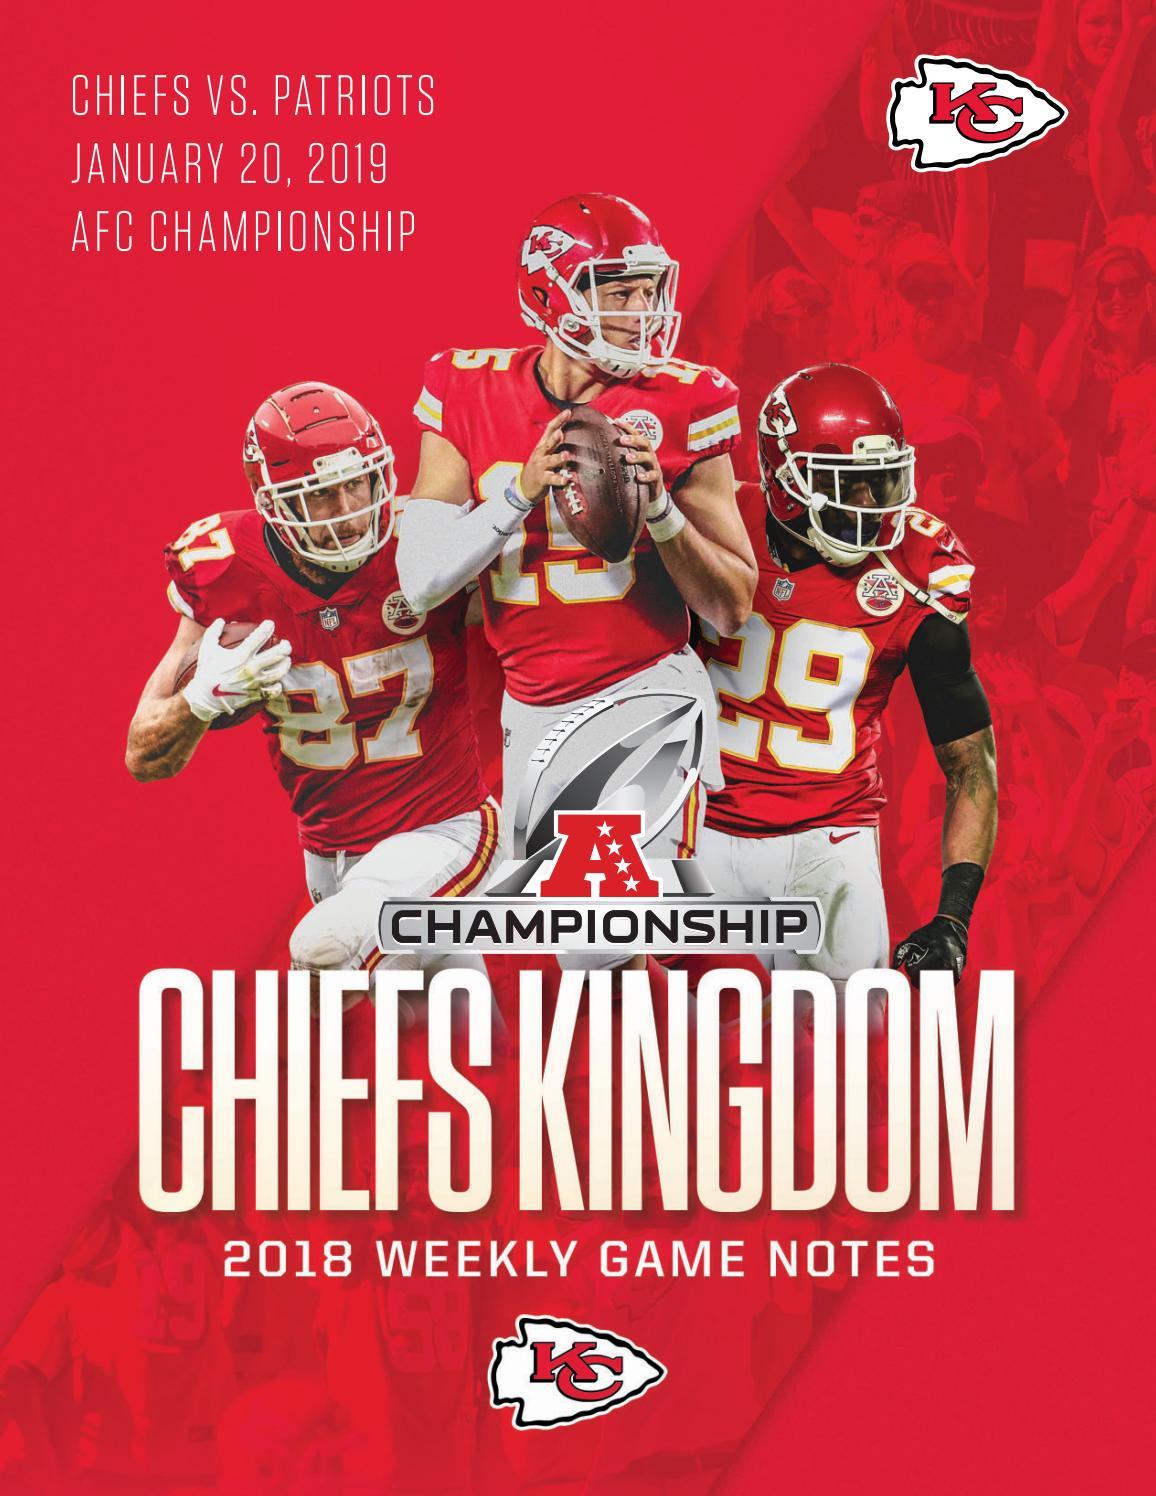 Afc Championship Game Chiefs Vs Patriots 1 20 19 By Kansas City Chiefs Issuu